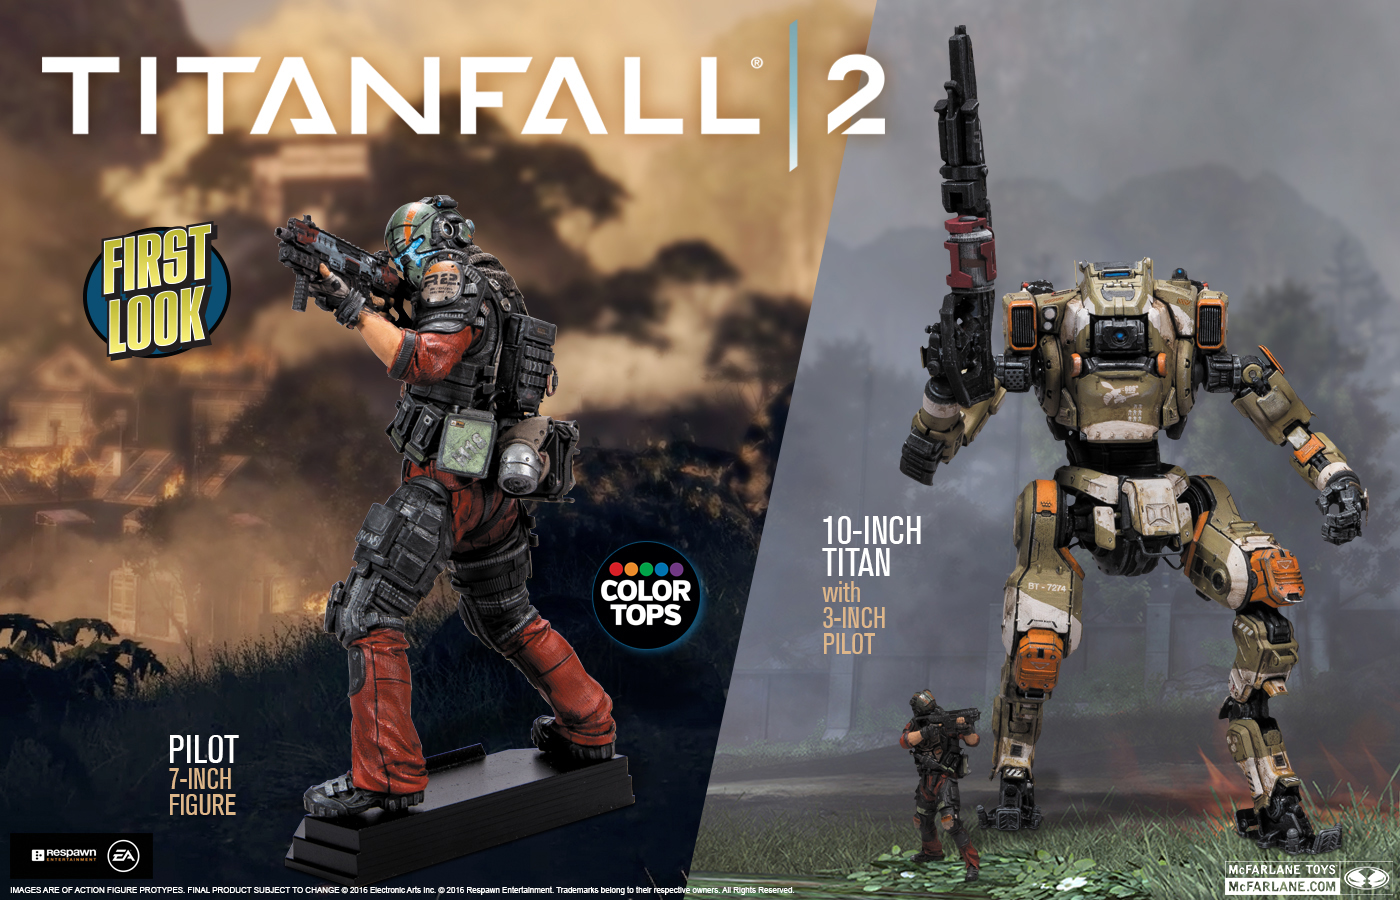 Mcfarlane Toys Titanfall 2 Figures Coming This Fall